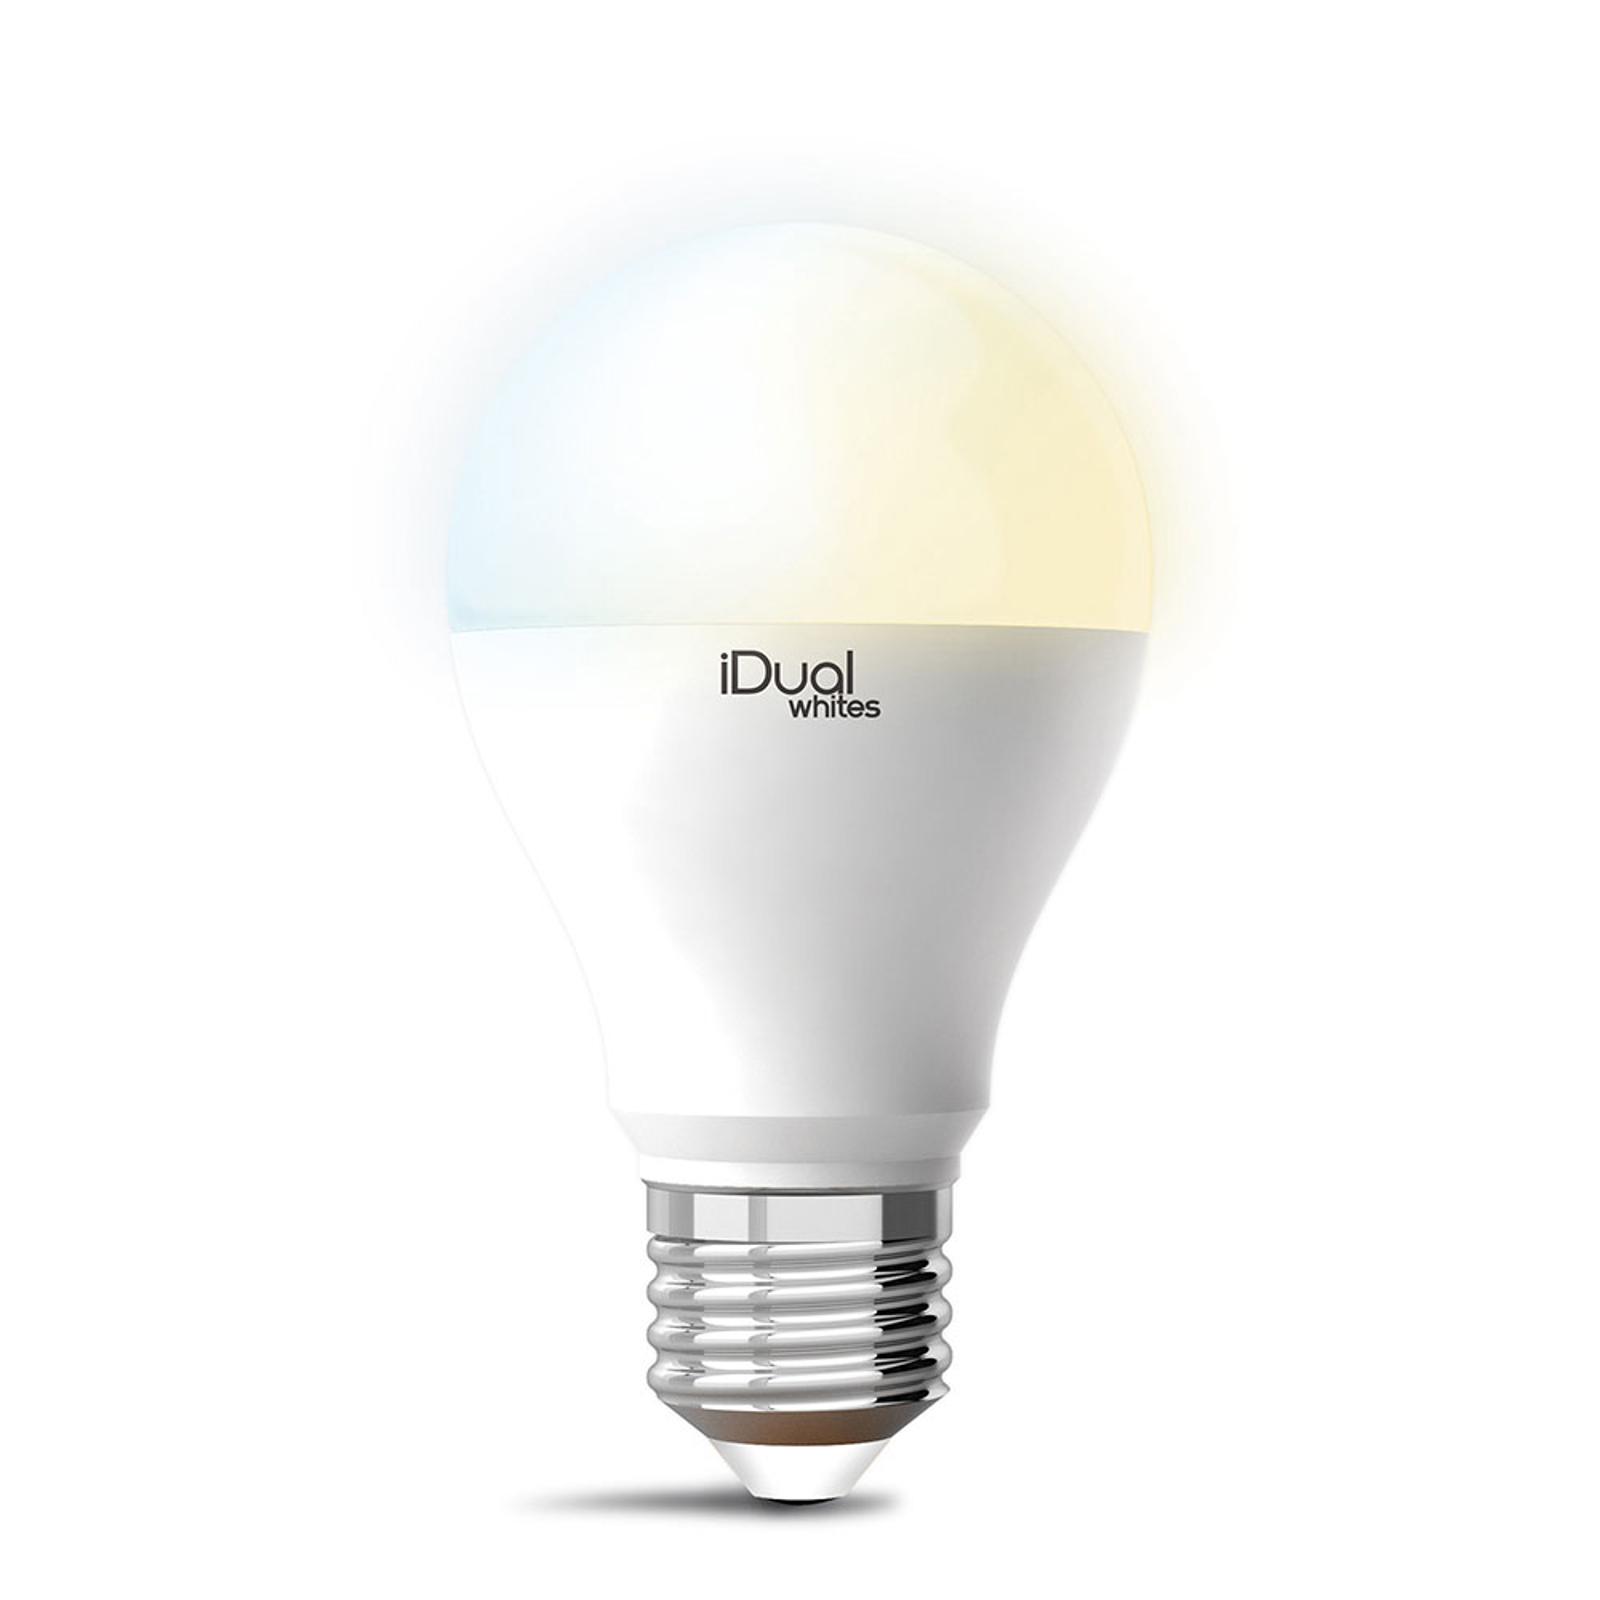 iDual Whites LED-pære E27 A60 10 W, tunable white